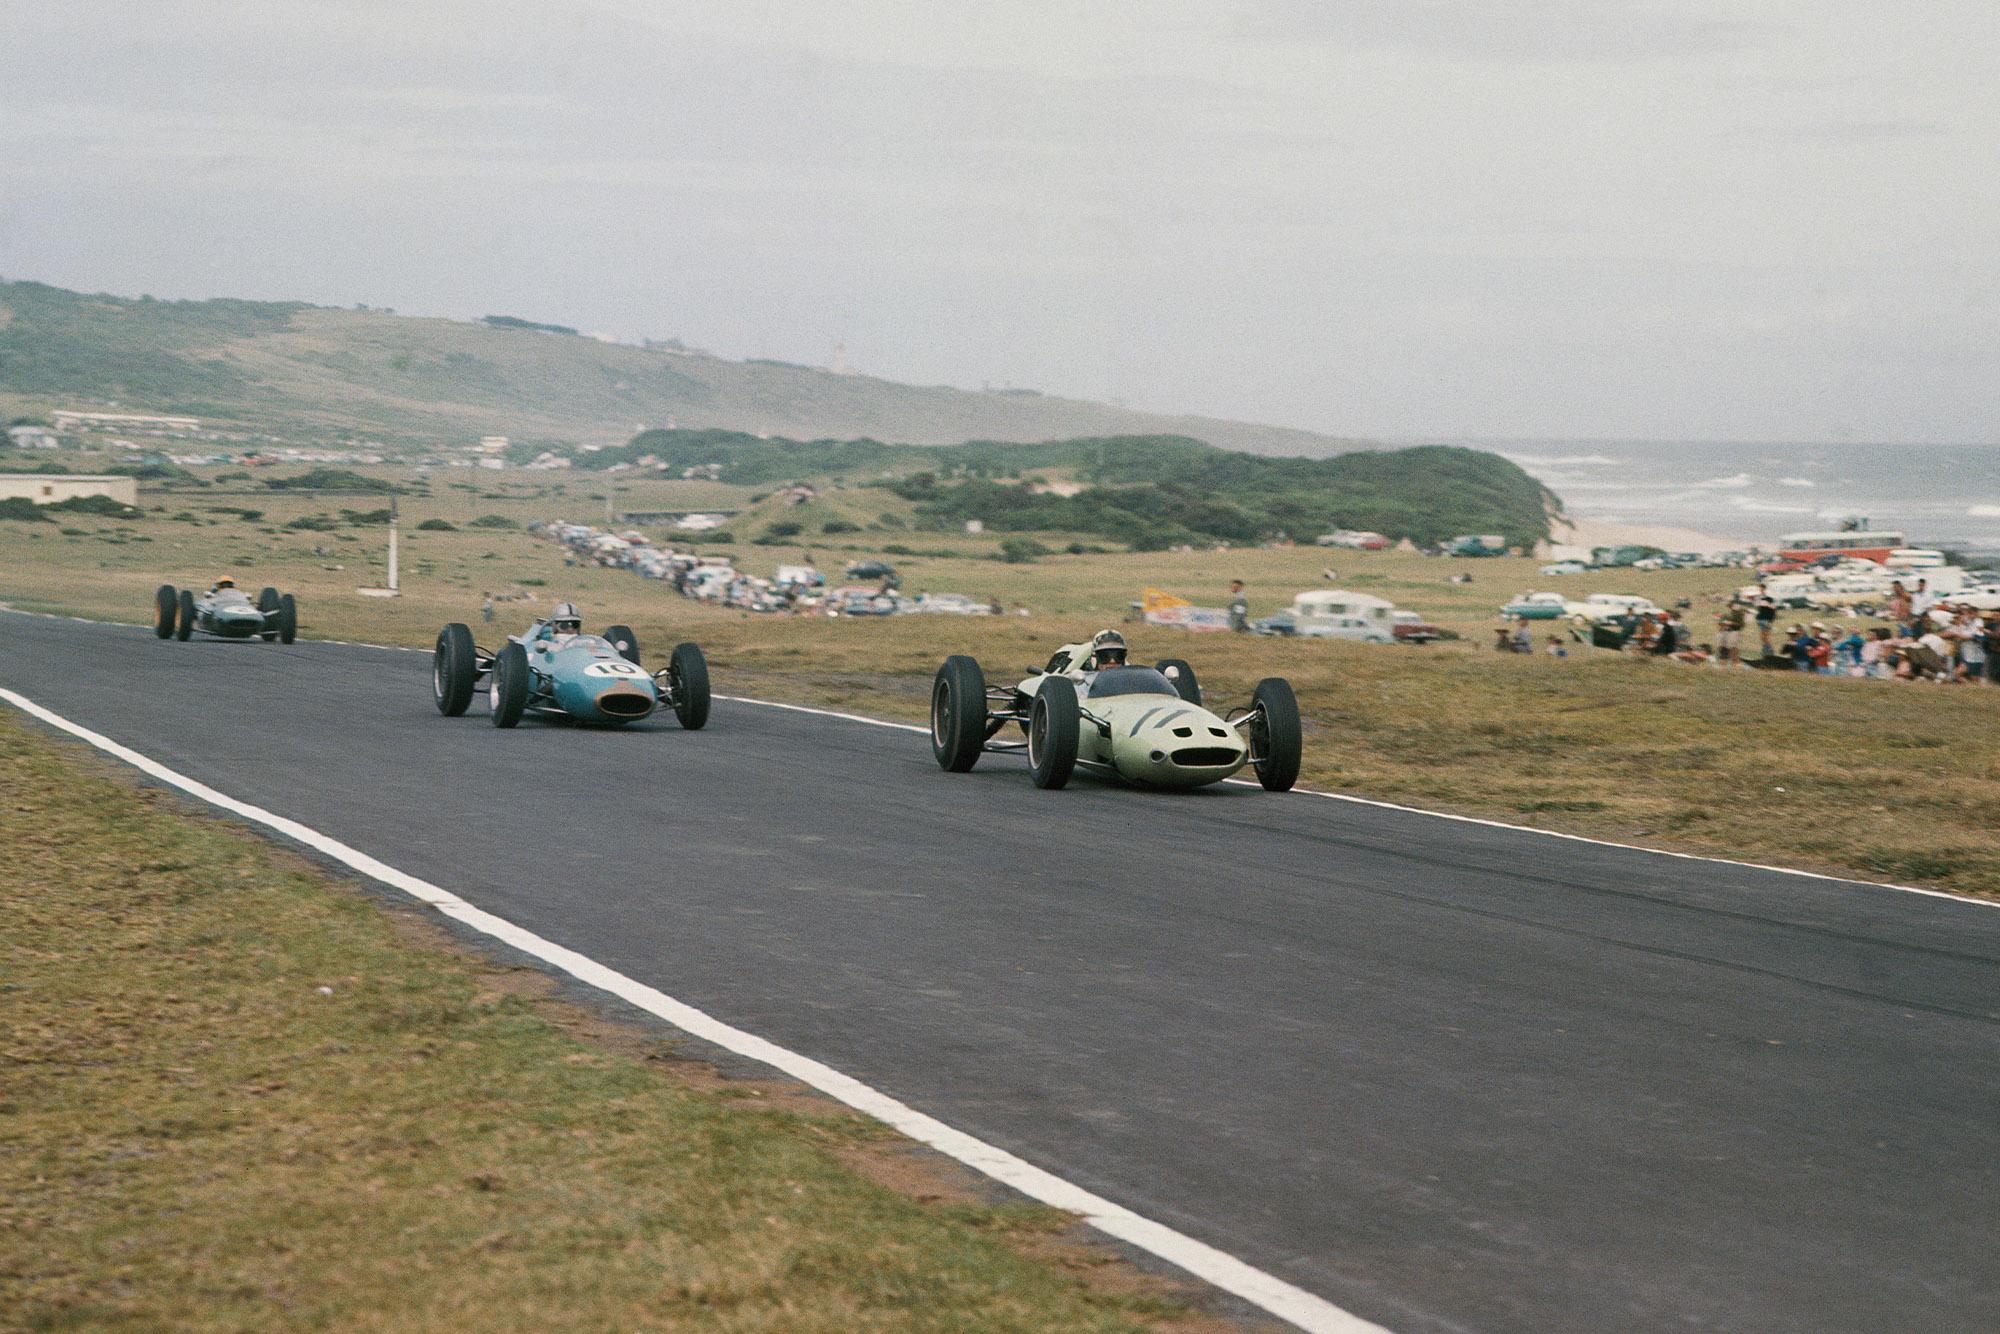 Innes Ireland (Lotus 24 Climax) leads Jack Brabham (Brabham BT3 Climax) and Trevor Taylor (Lotus 25 Climax).